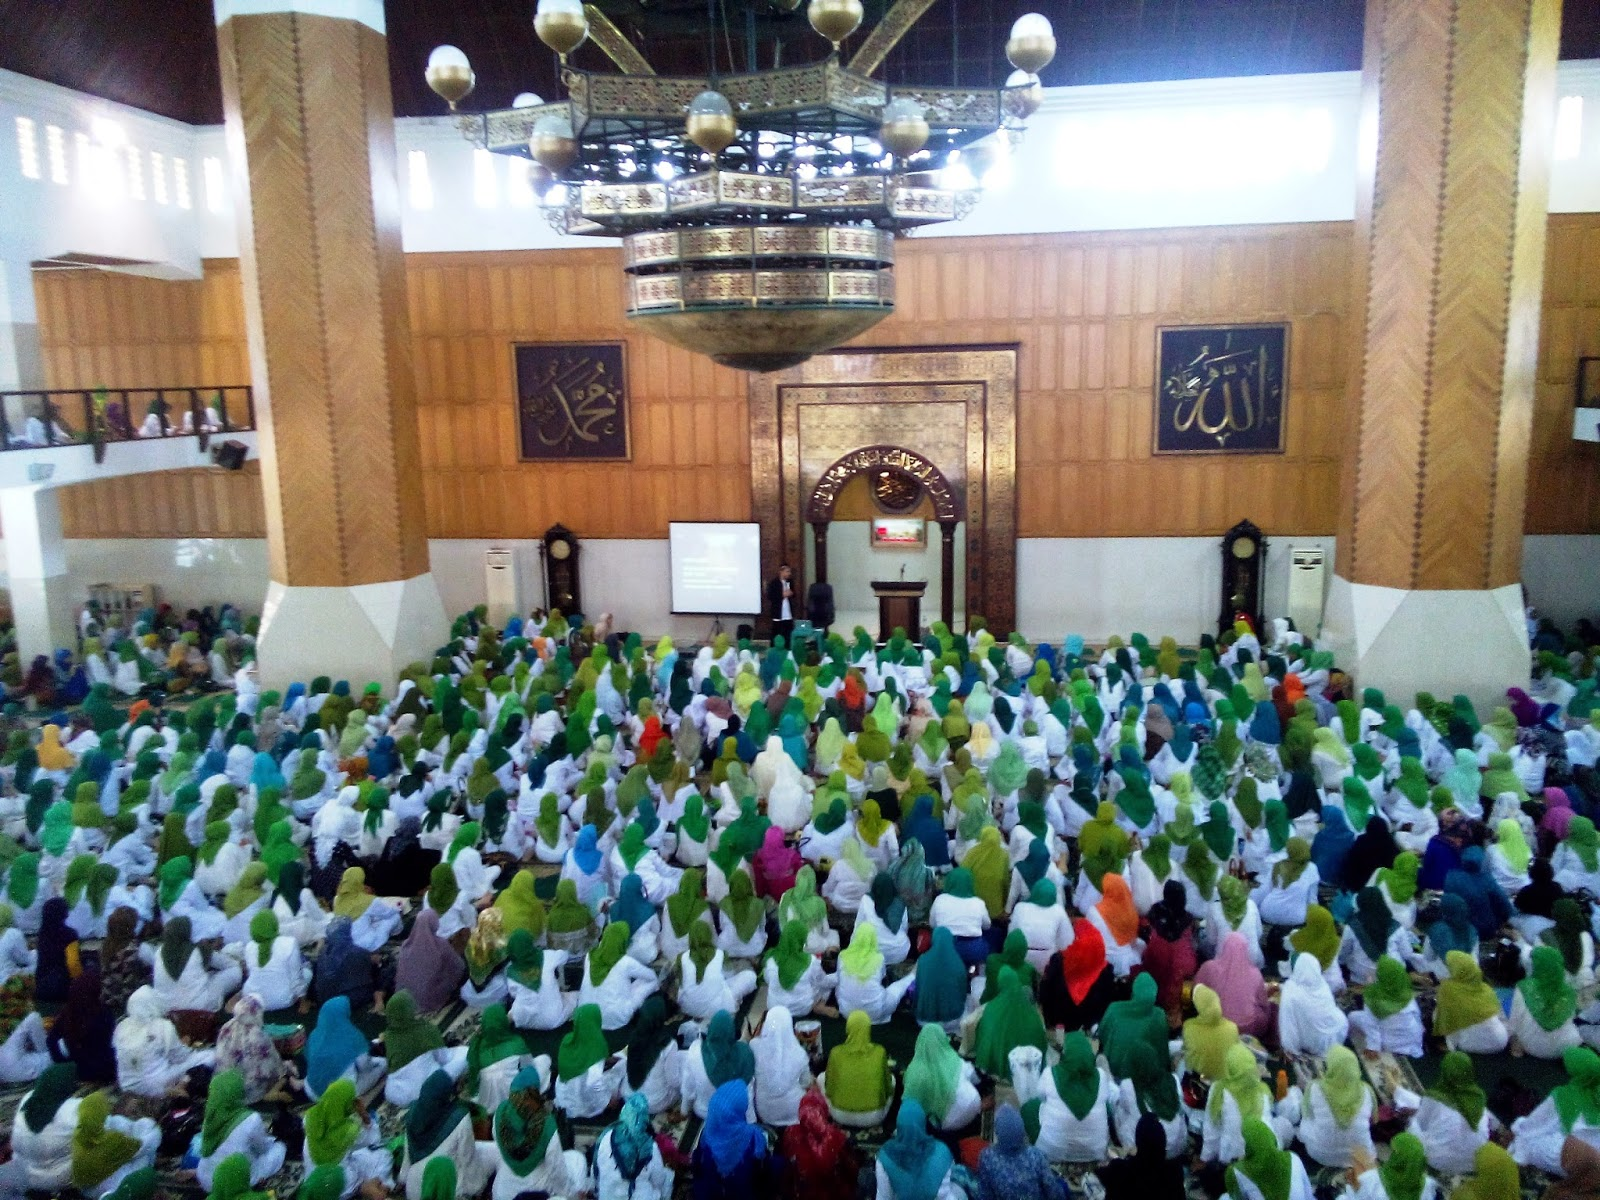 ceramah motivasi, training motivasi, maulid nabi, edvan m kautsar, motivator tasik, motivator muda, motivator nasional, motivator islami. motivator terbaik